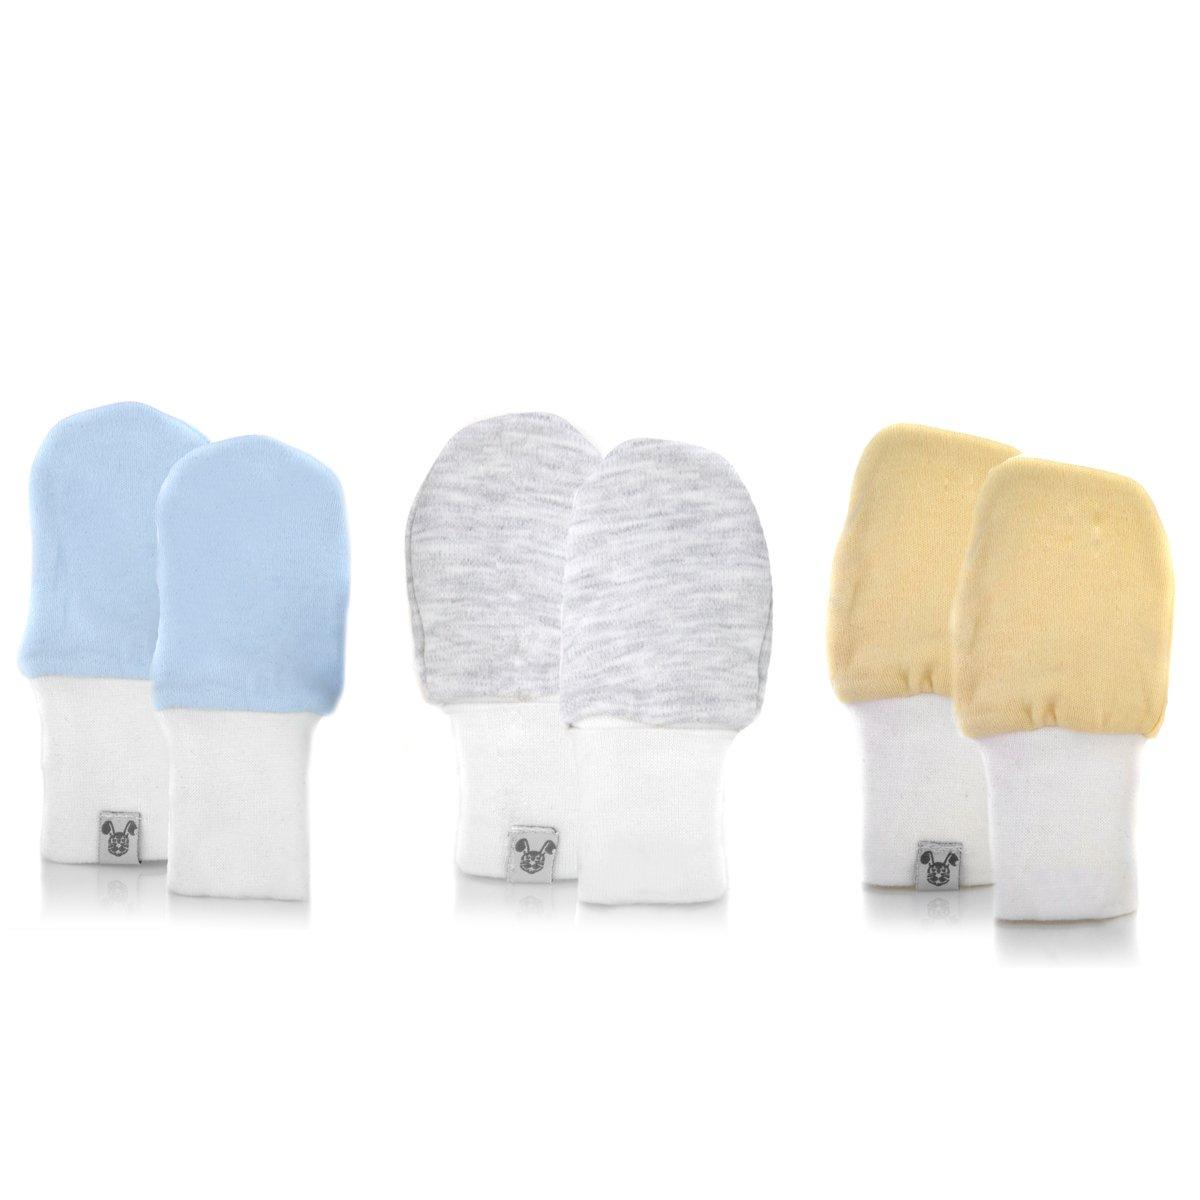 Crummy Bunny Newborn Baby Mittens - Blue, Grey and White, No Scratch Mittens, 3 Pairs